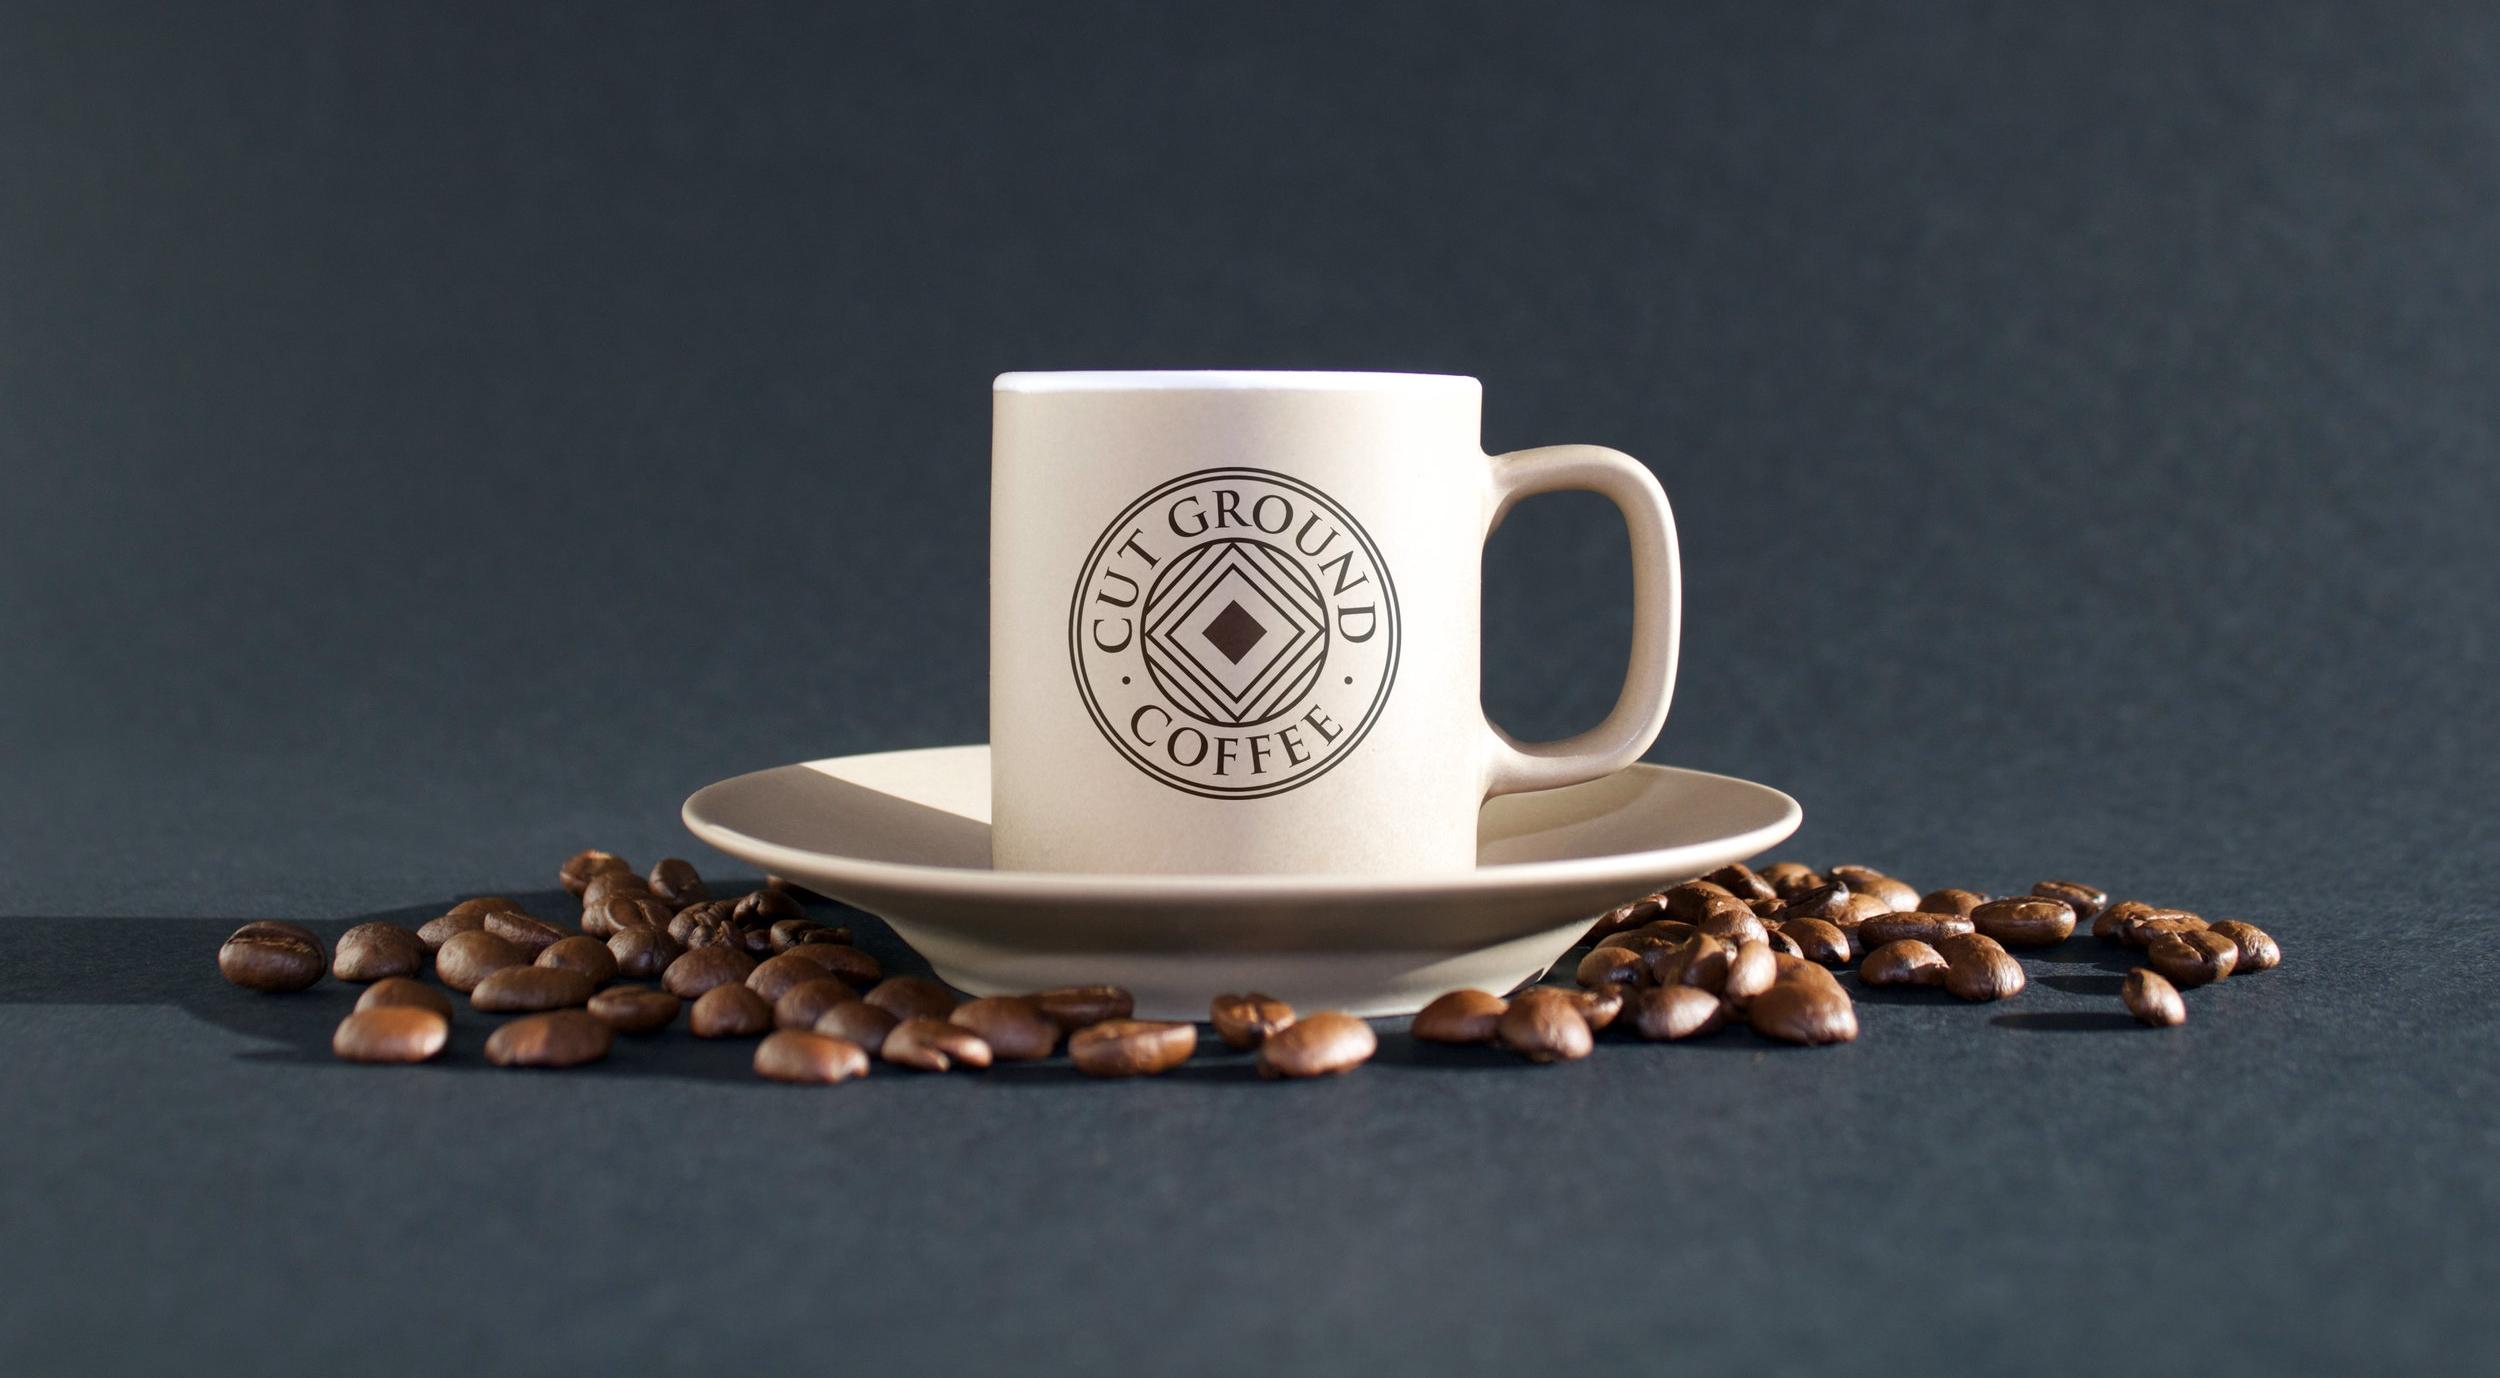 Our Revolution Packaging Design Agency Brand Design Logo Design Brand Strategy Brand Innovation Coffee Packaging Coffee Design Coffee Brand Coffee Branding Coffee Packaging Coffee innovation Packaging Innovation